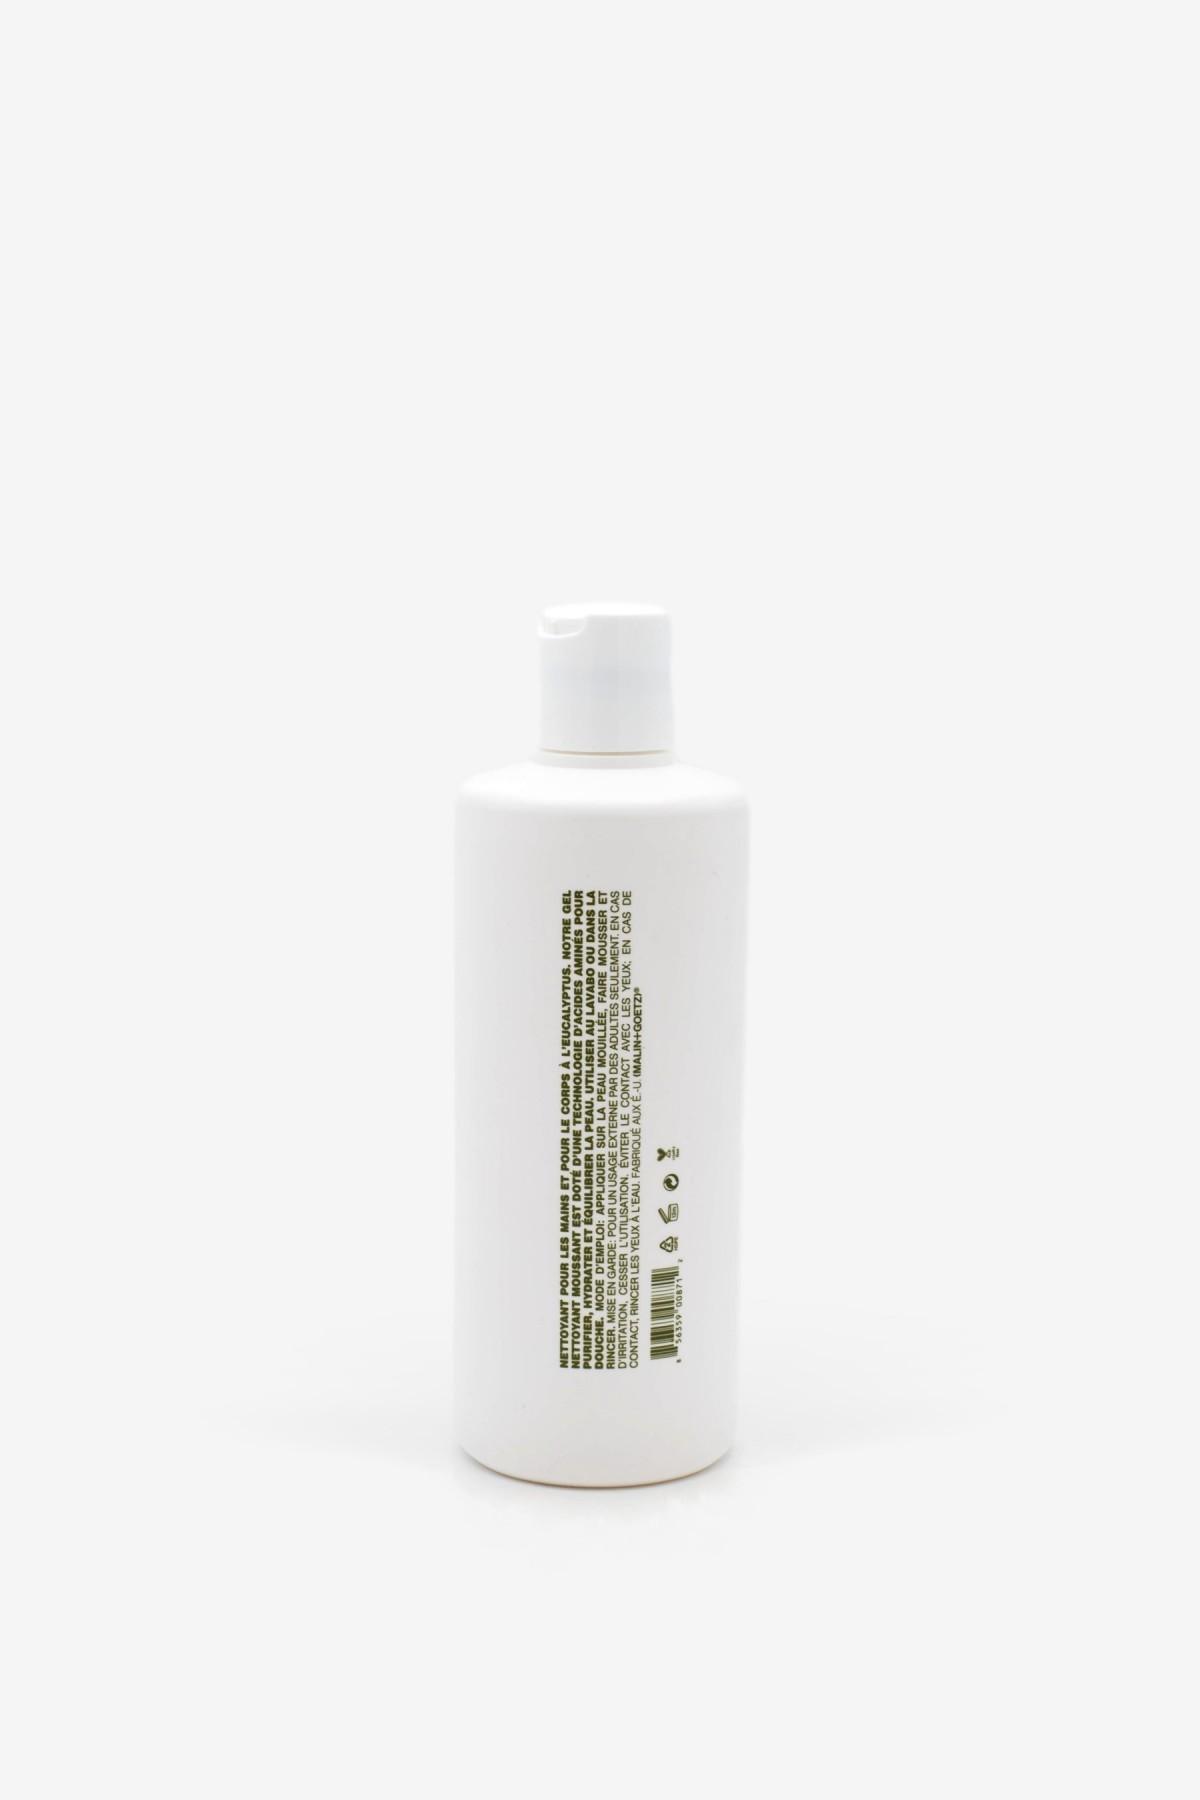 Malin+Goetz Eucalyptus Hand + Body Wash 473ml in